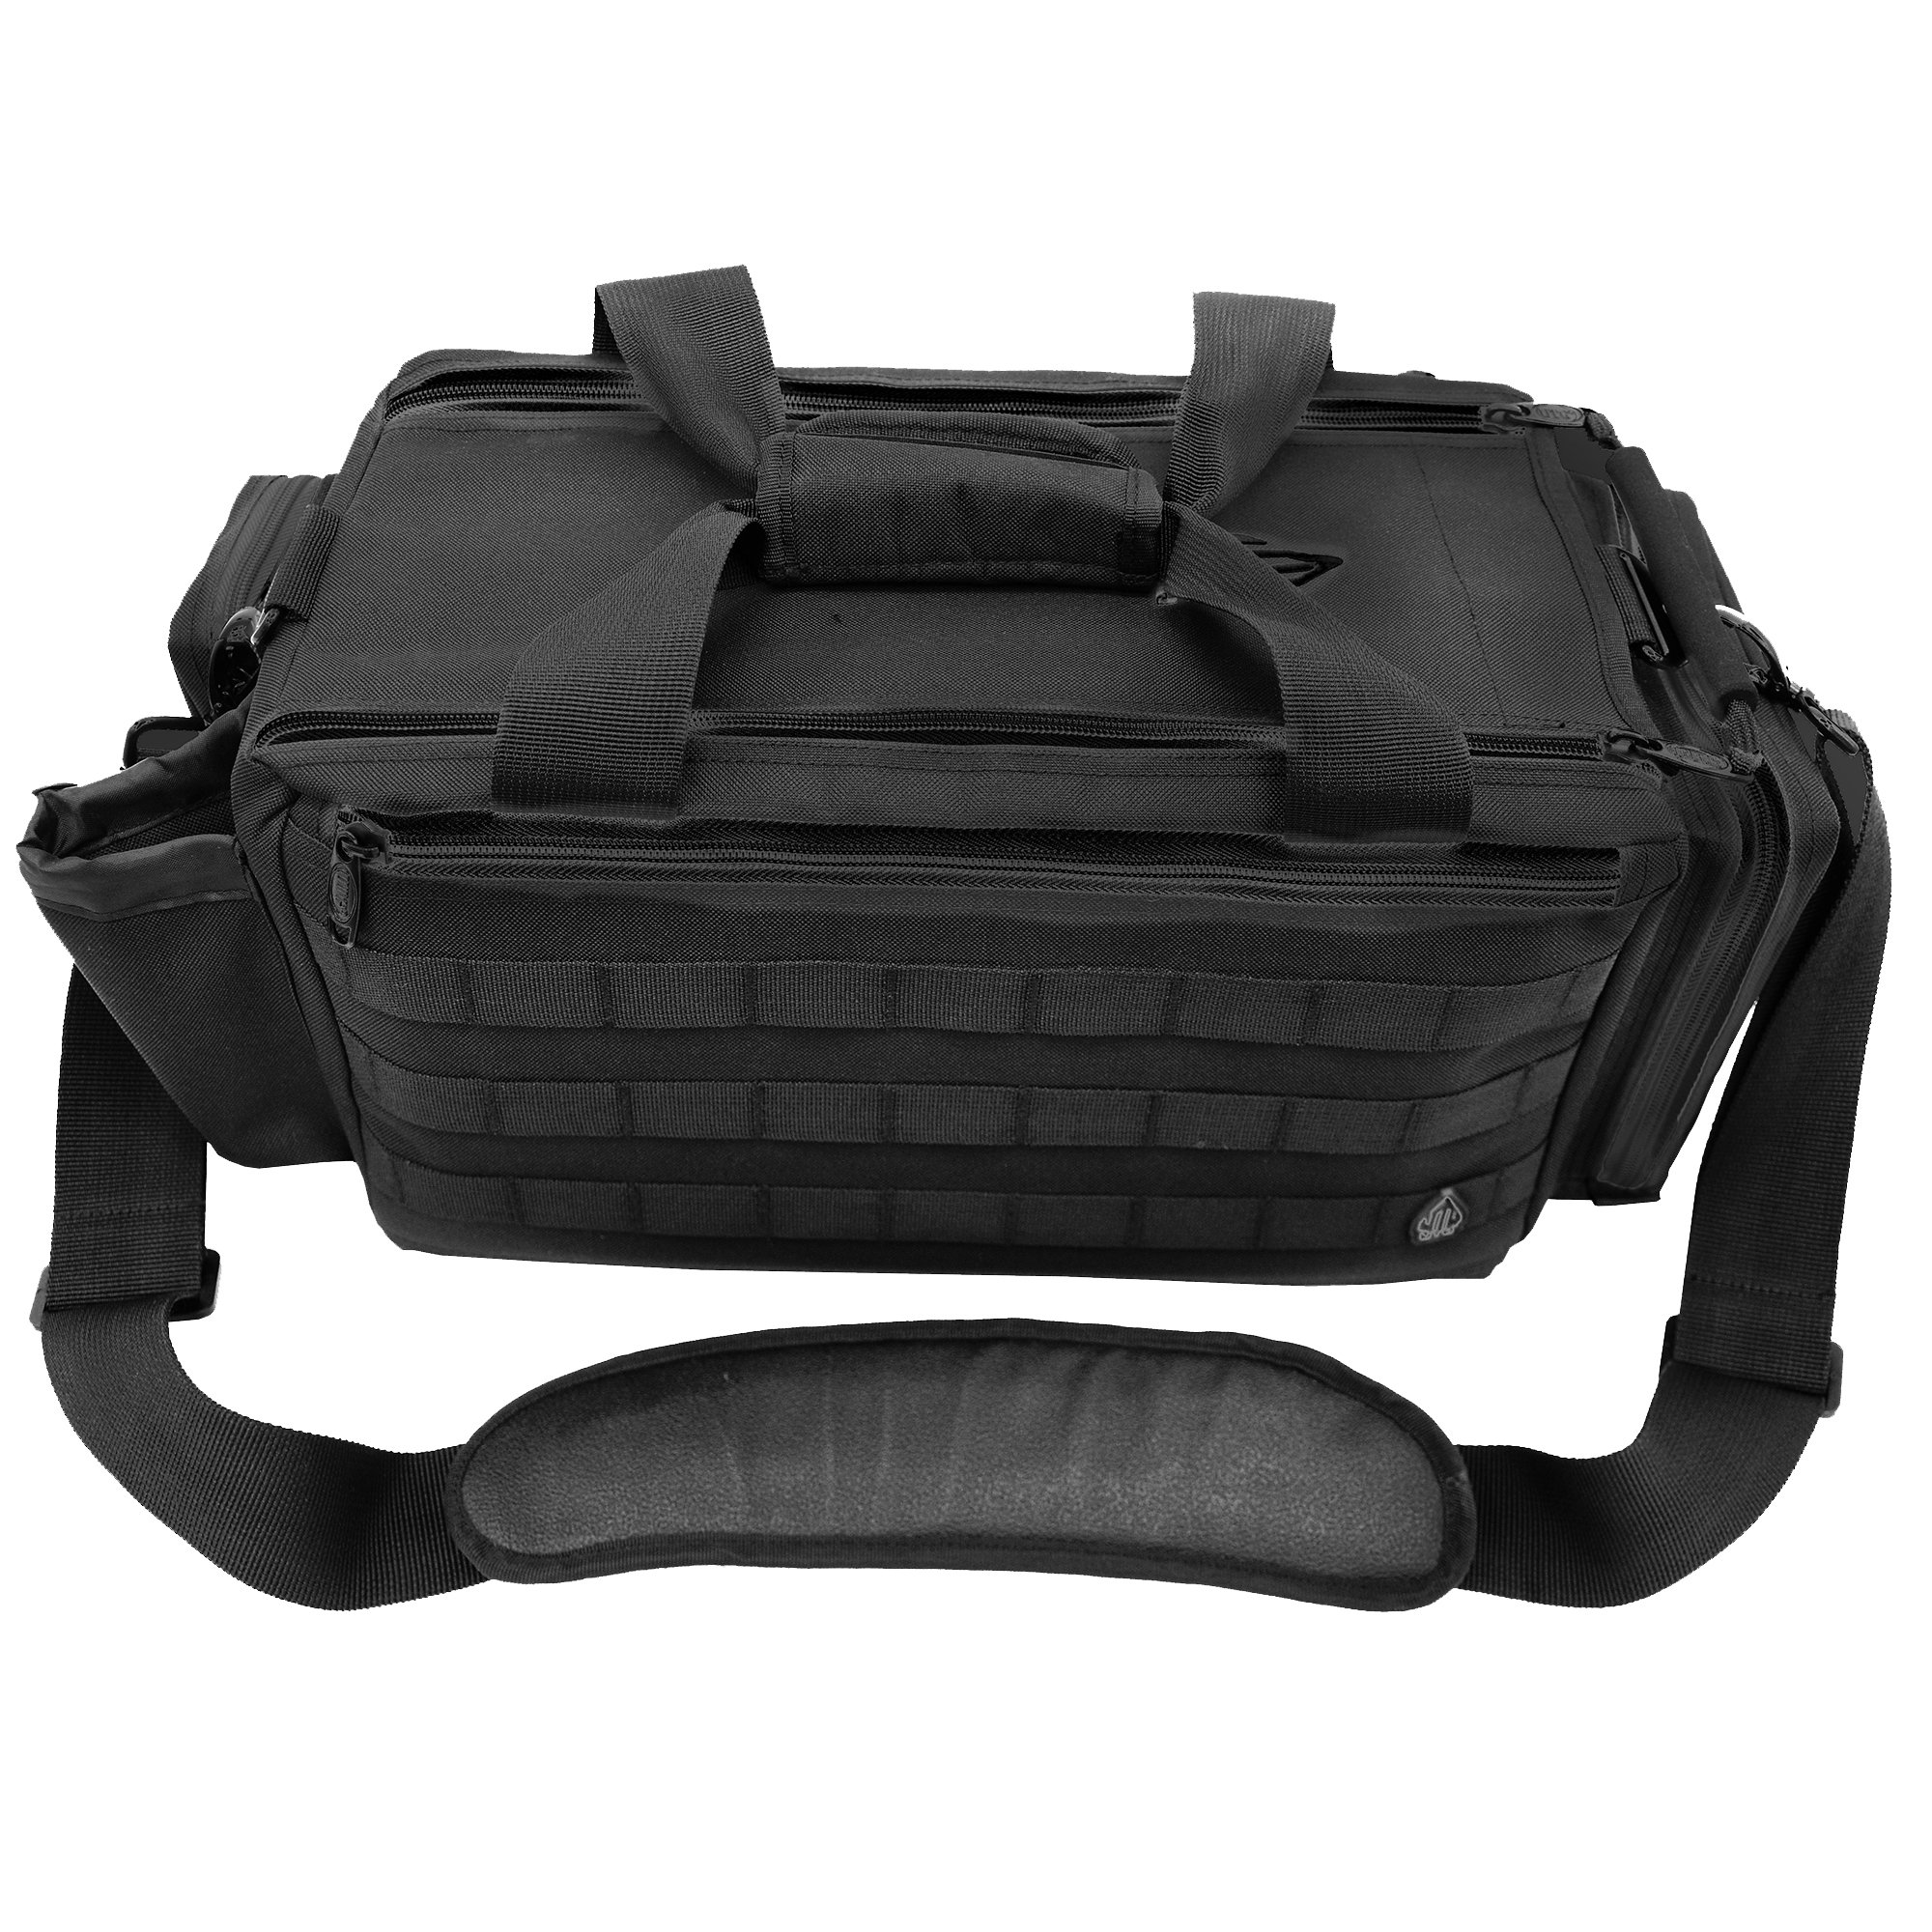 UTG All in One Range/Utility Go Bag, Black, 21'' x 10'' x 9'' by UTG (Image #1)